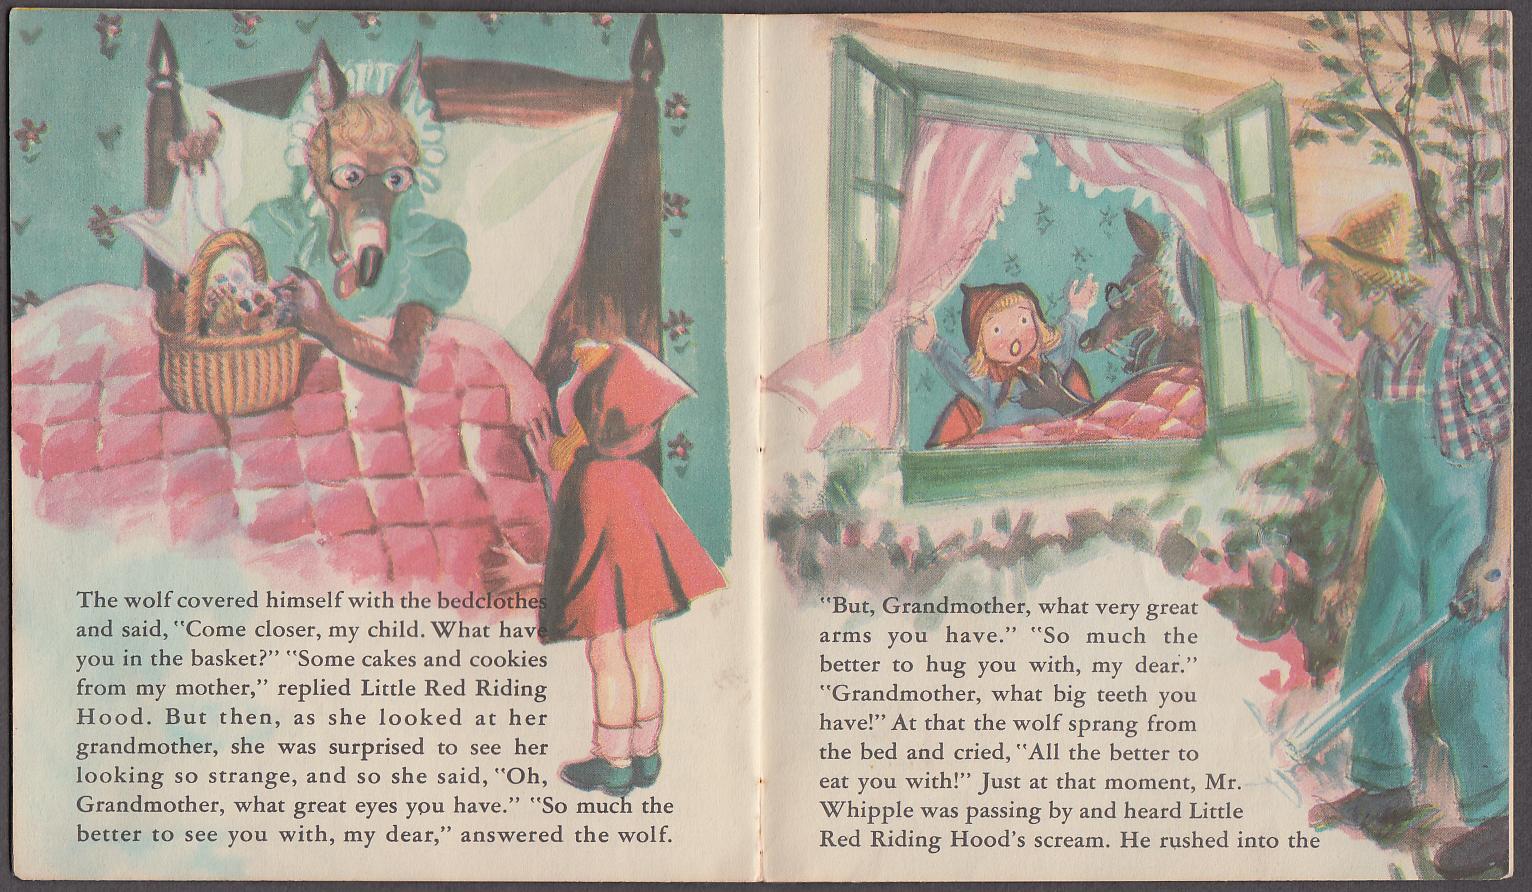 Little Red Riding Hood Wishin' Book 1950 Eoina artwork